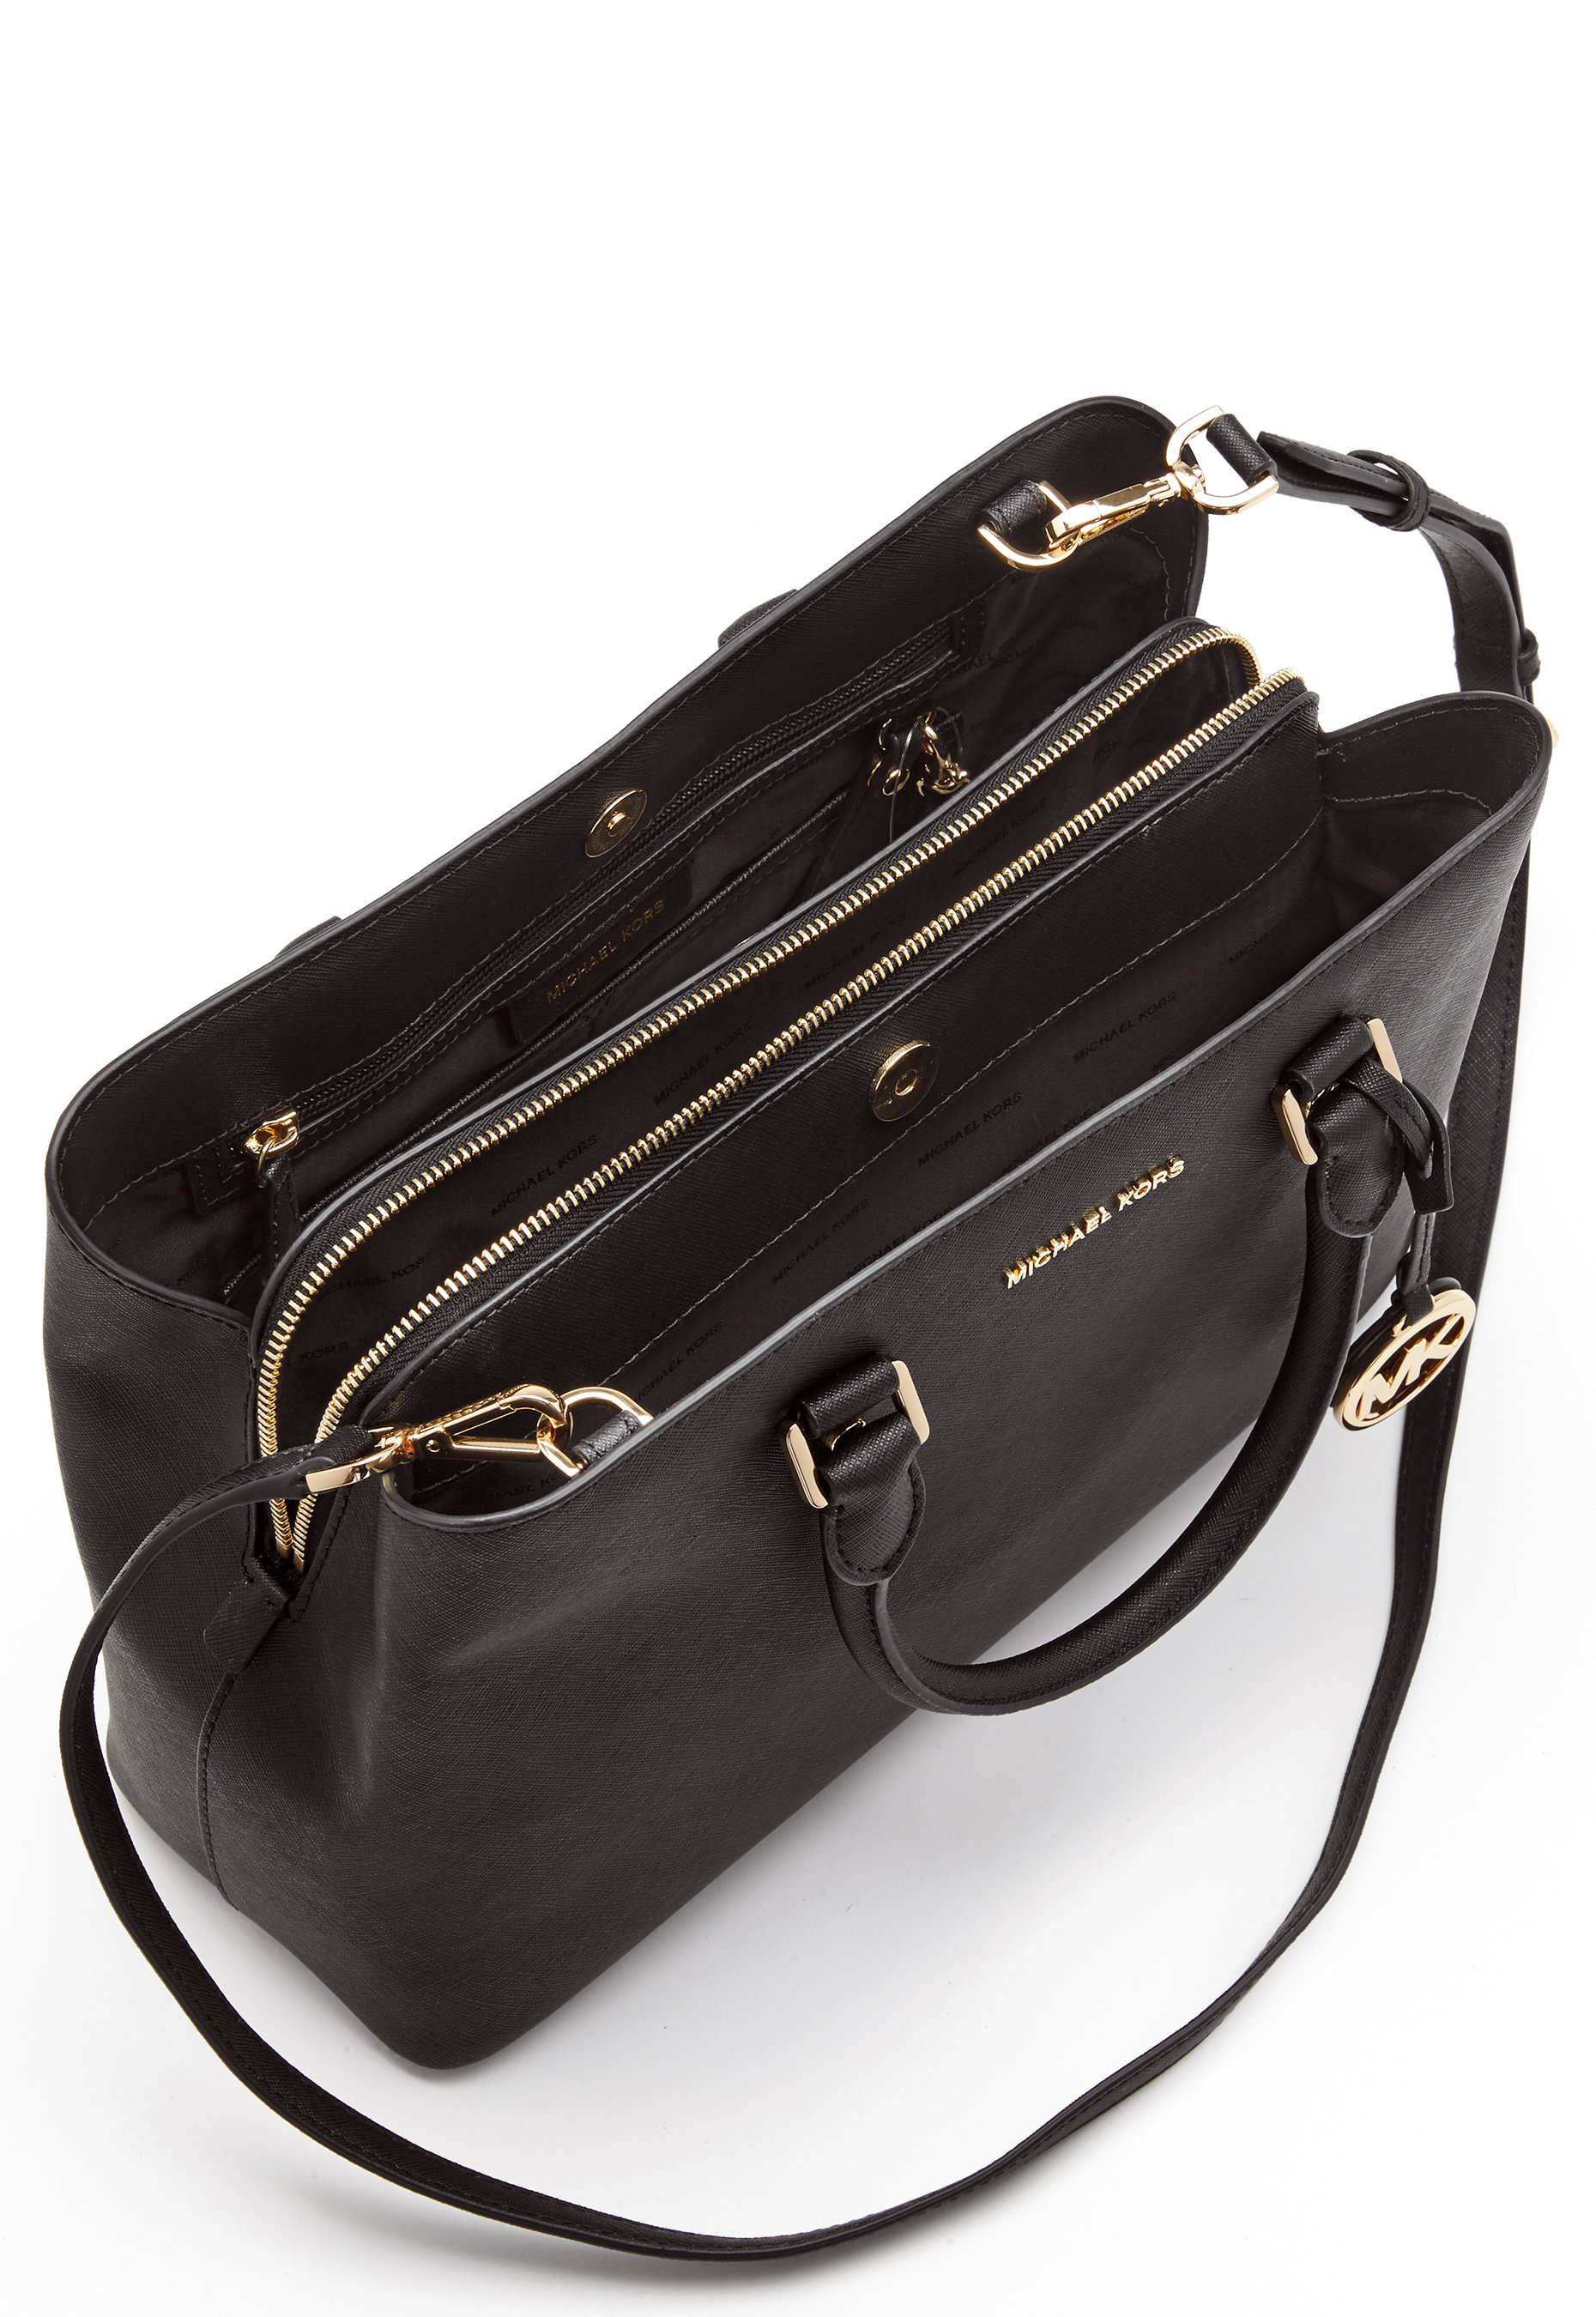 Michael Michael Kors Savannah LG Satchel Bag 001 Black